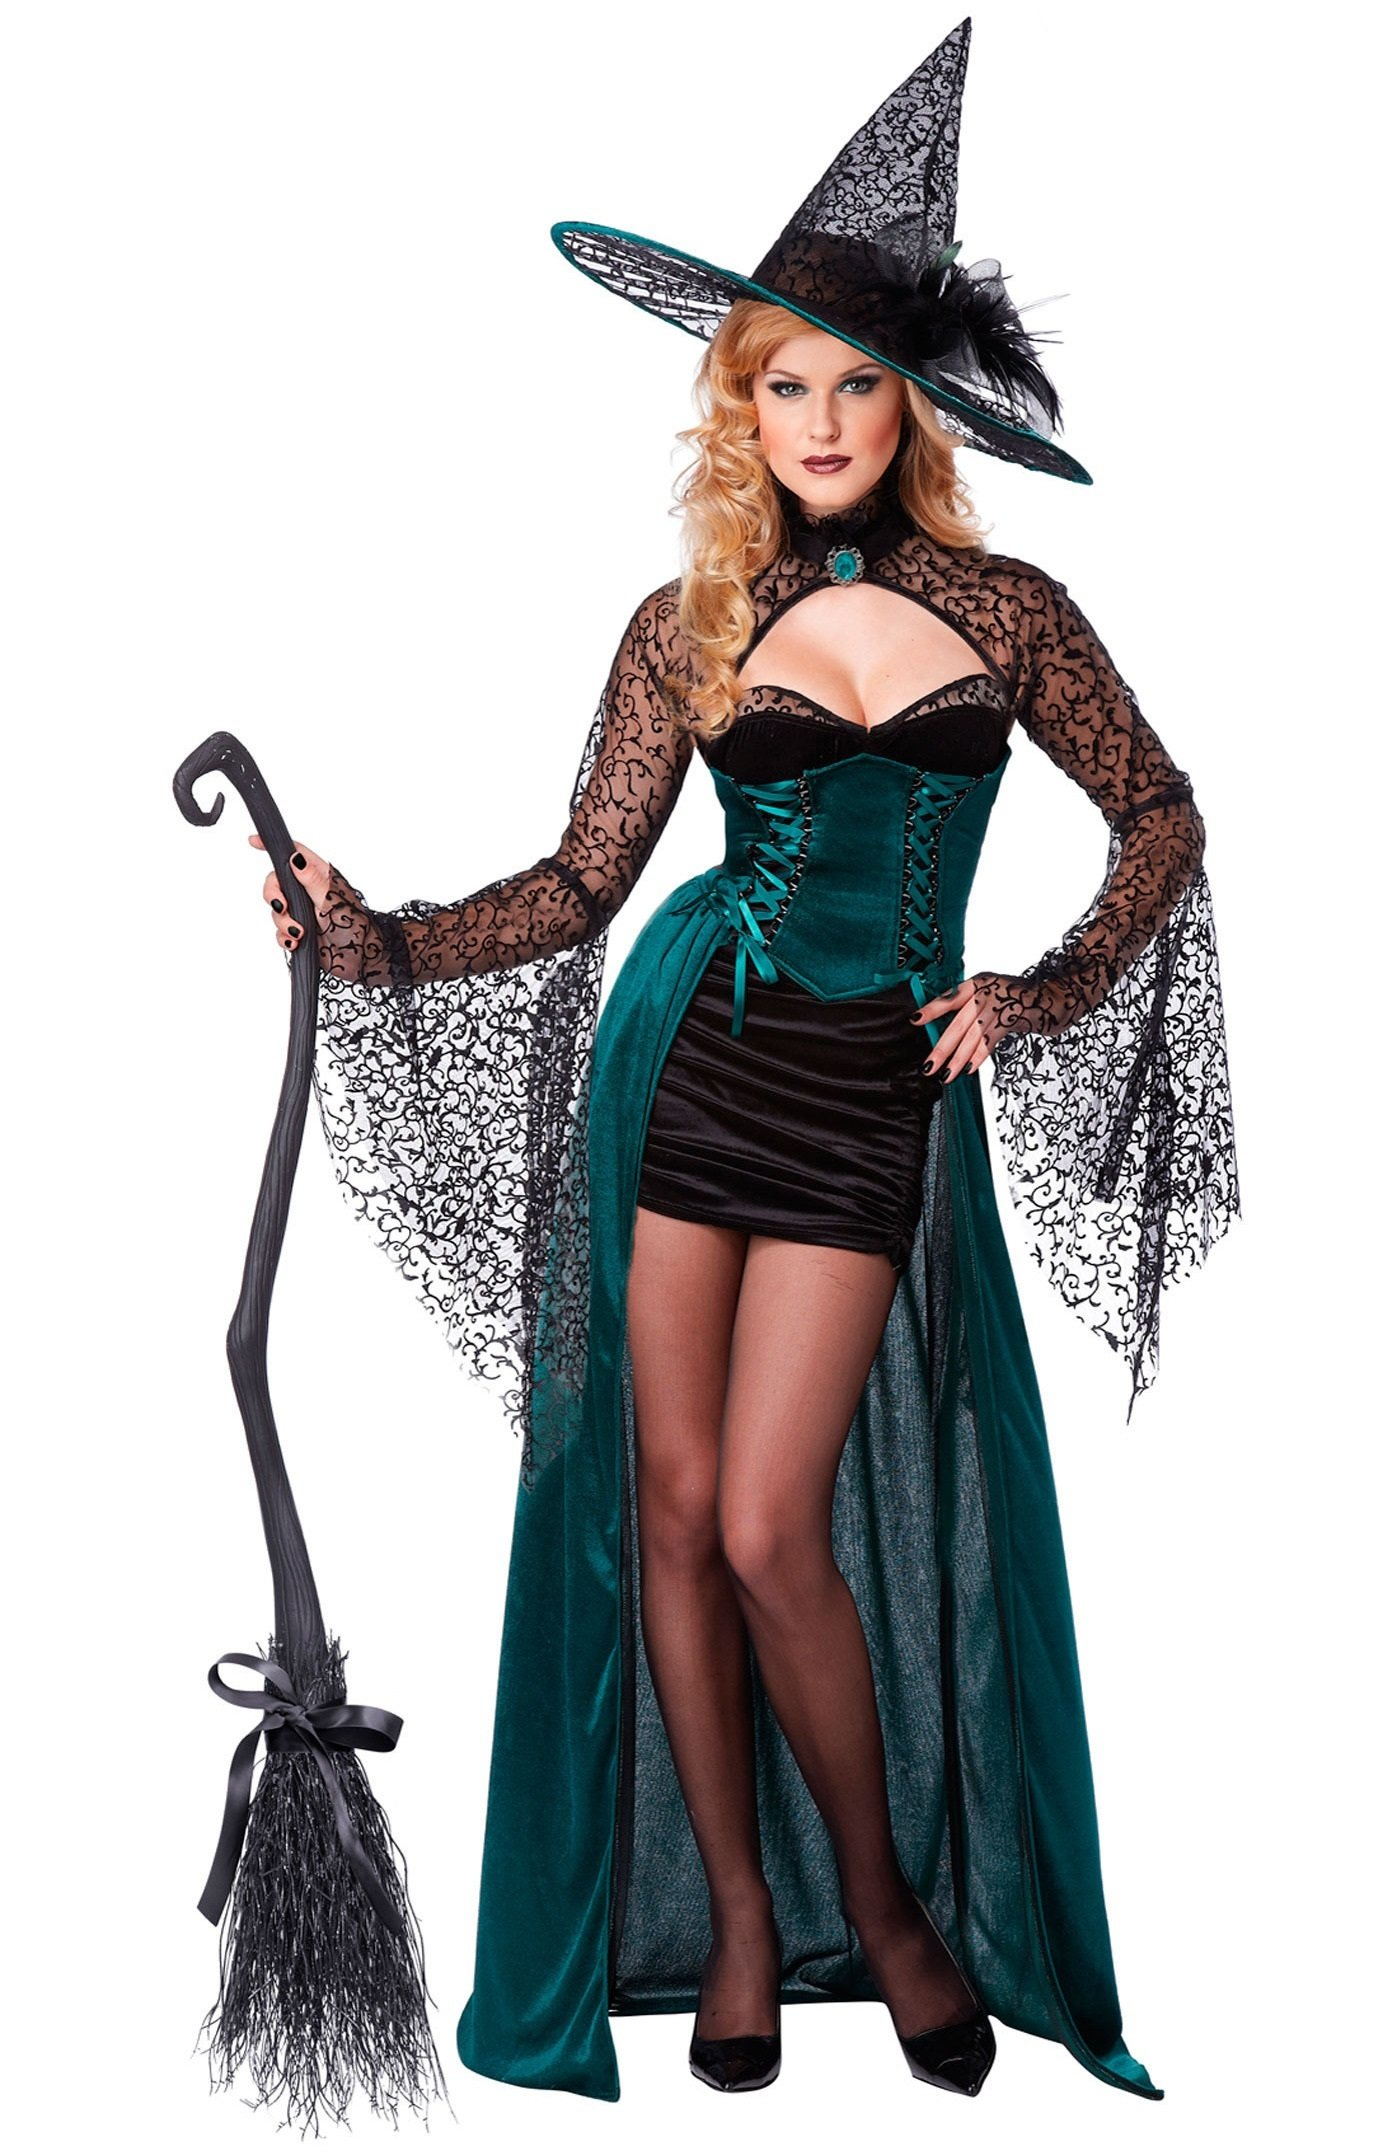 Аренда костюмов на хэллоуин